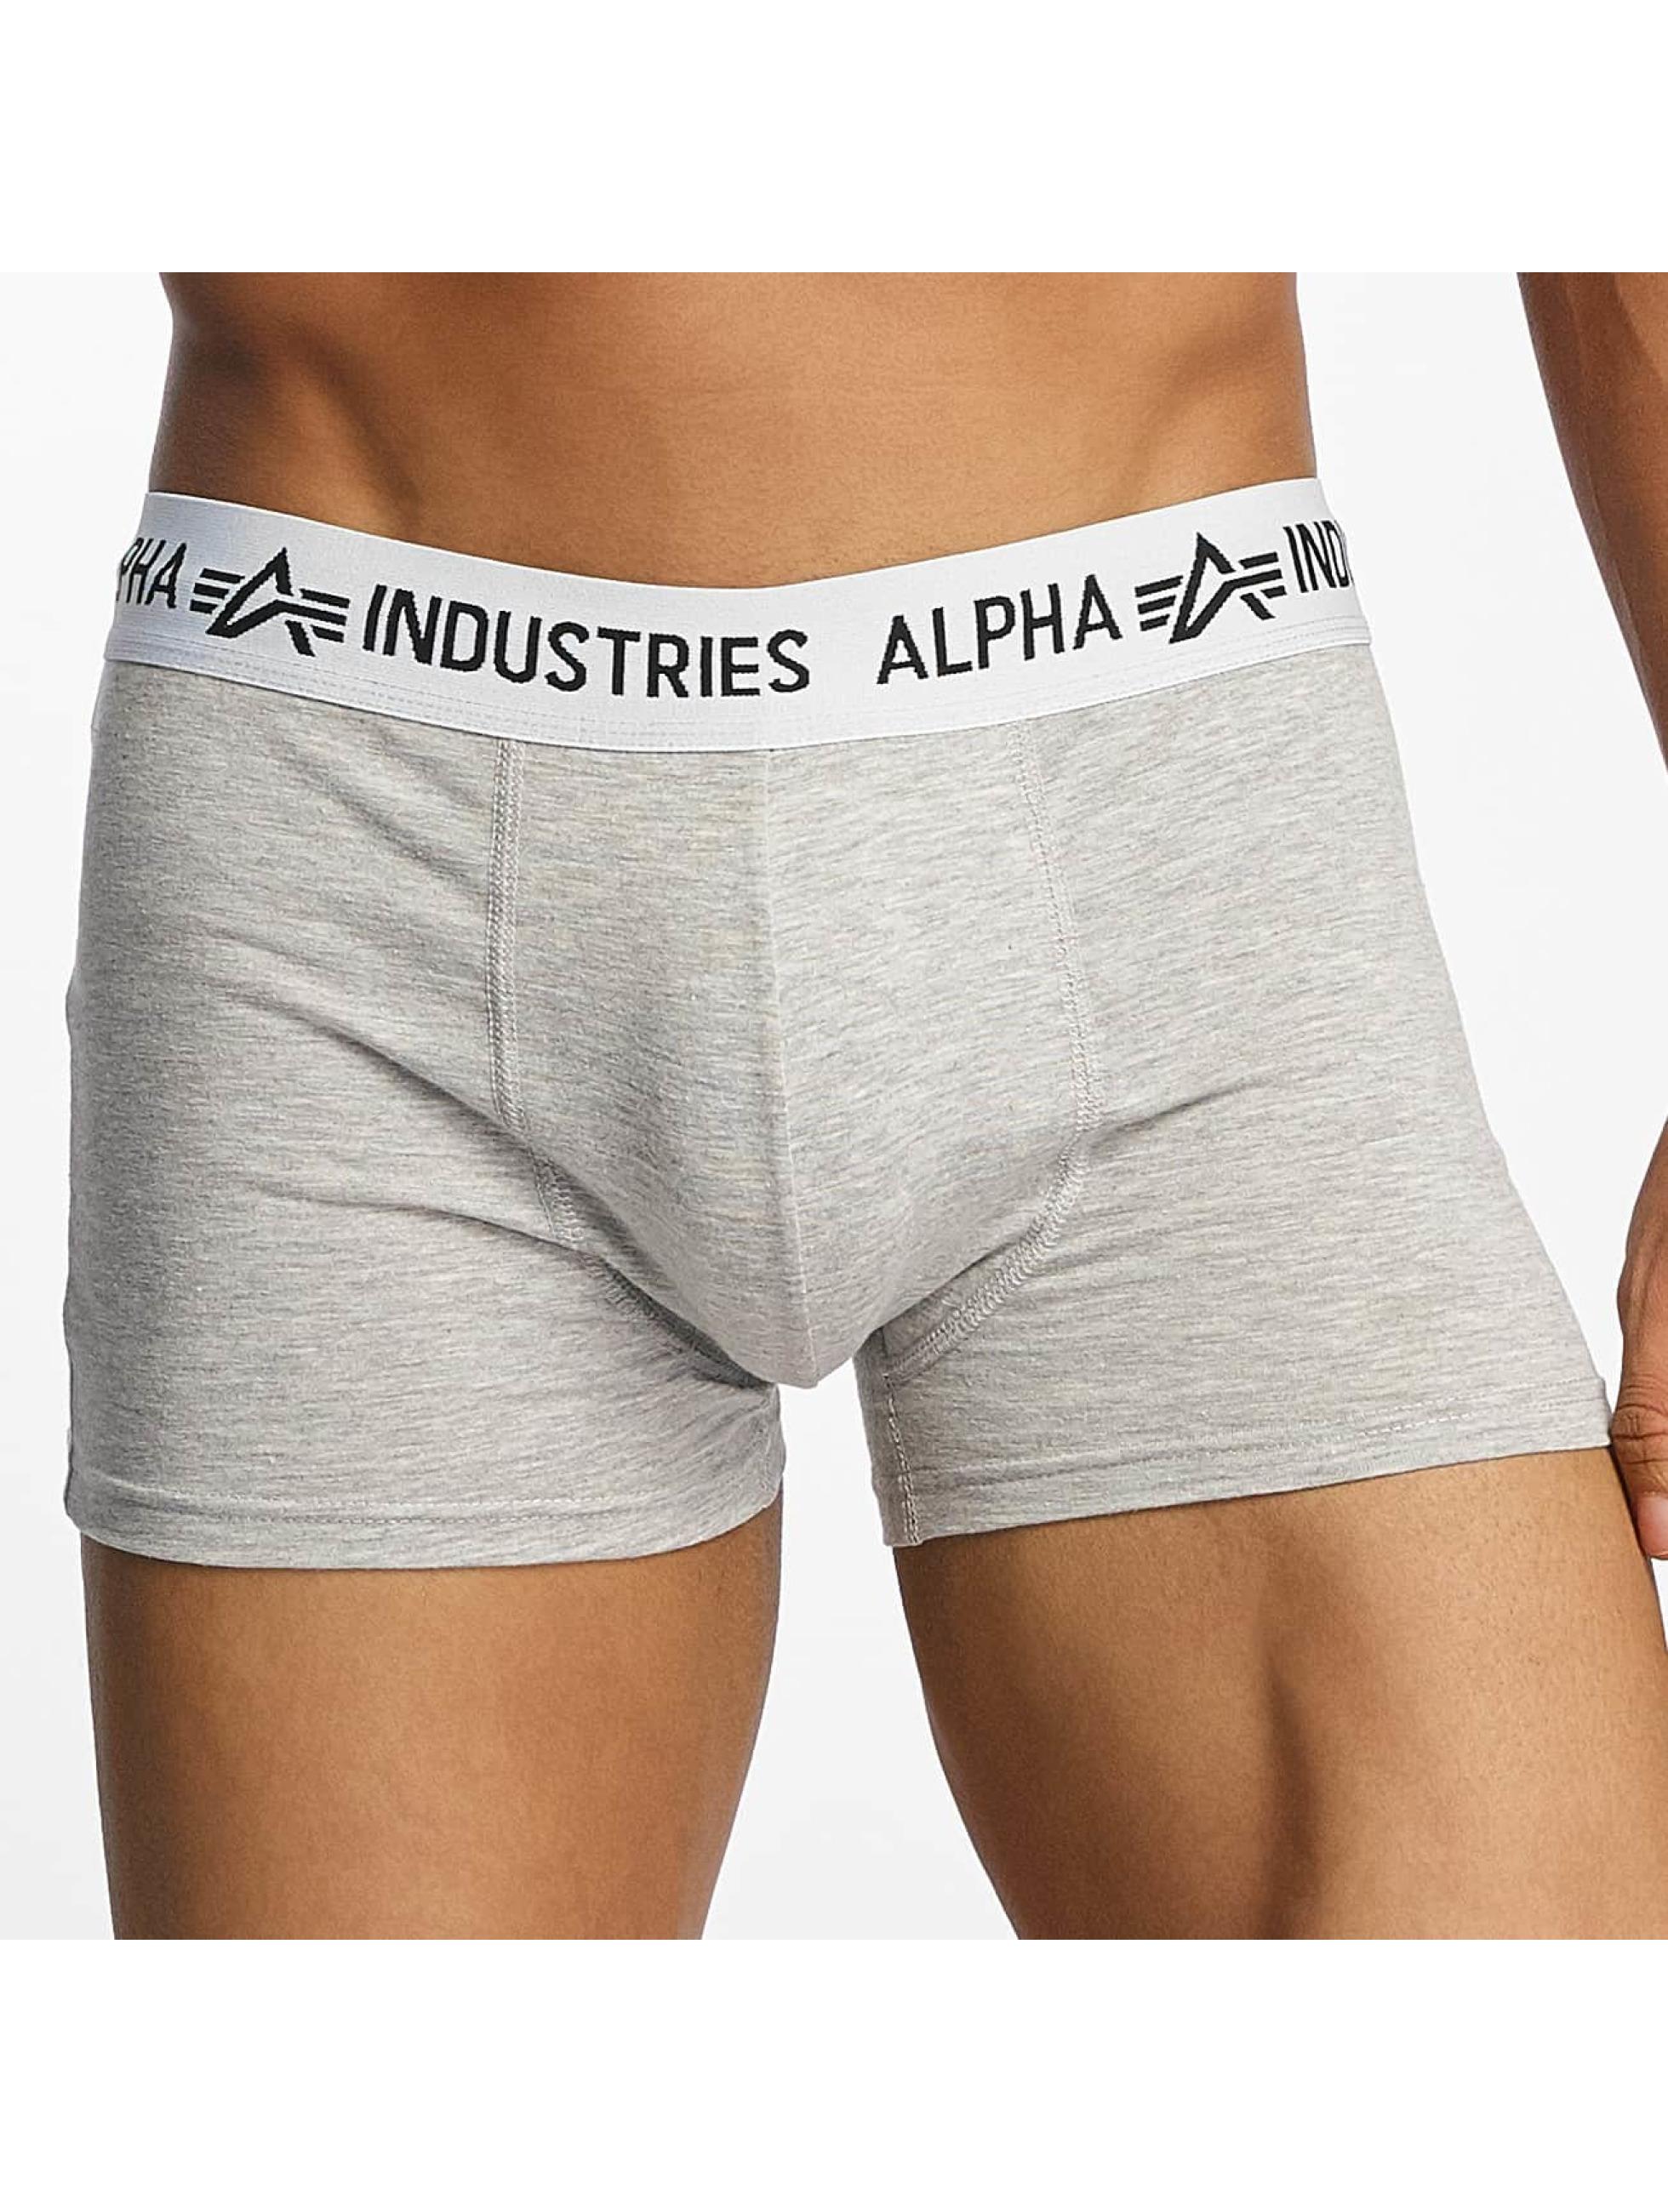 Alpha Industries Boxershorts Trunk grau